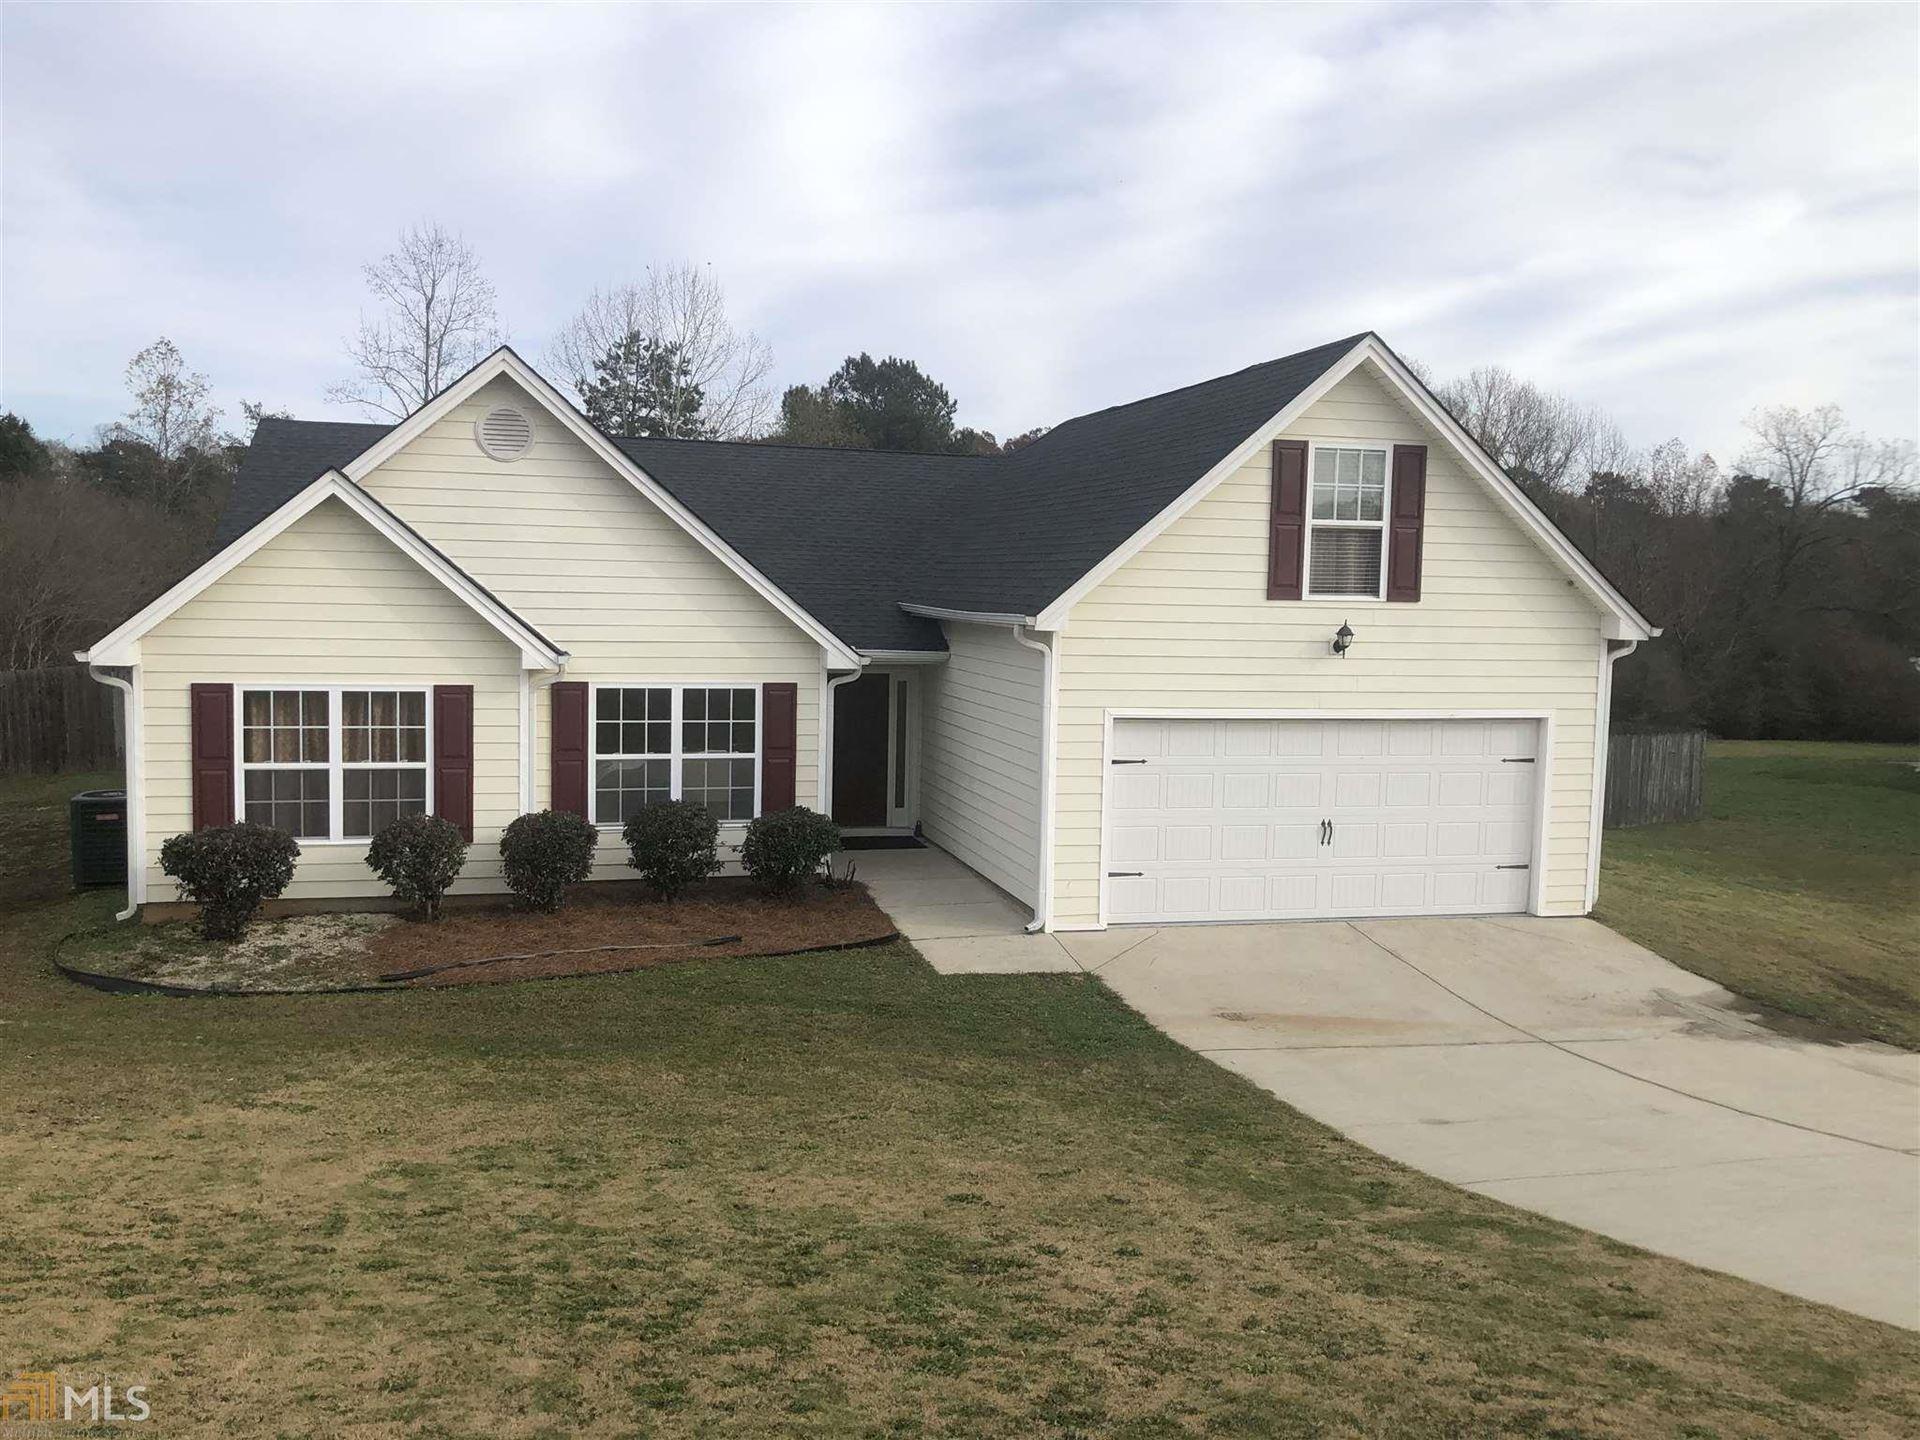 1416 Flanagan Mill, Auburn, GA 30011 - MLS#: 8894662